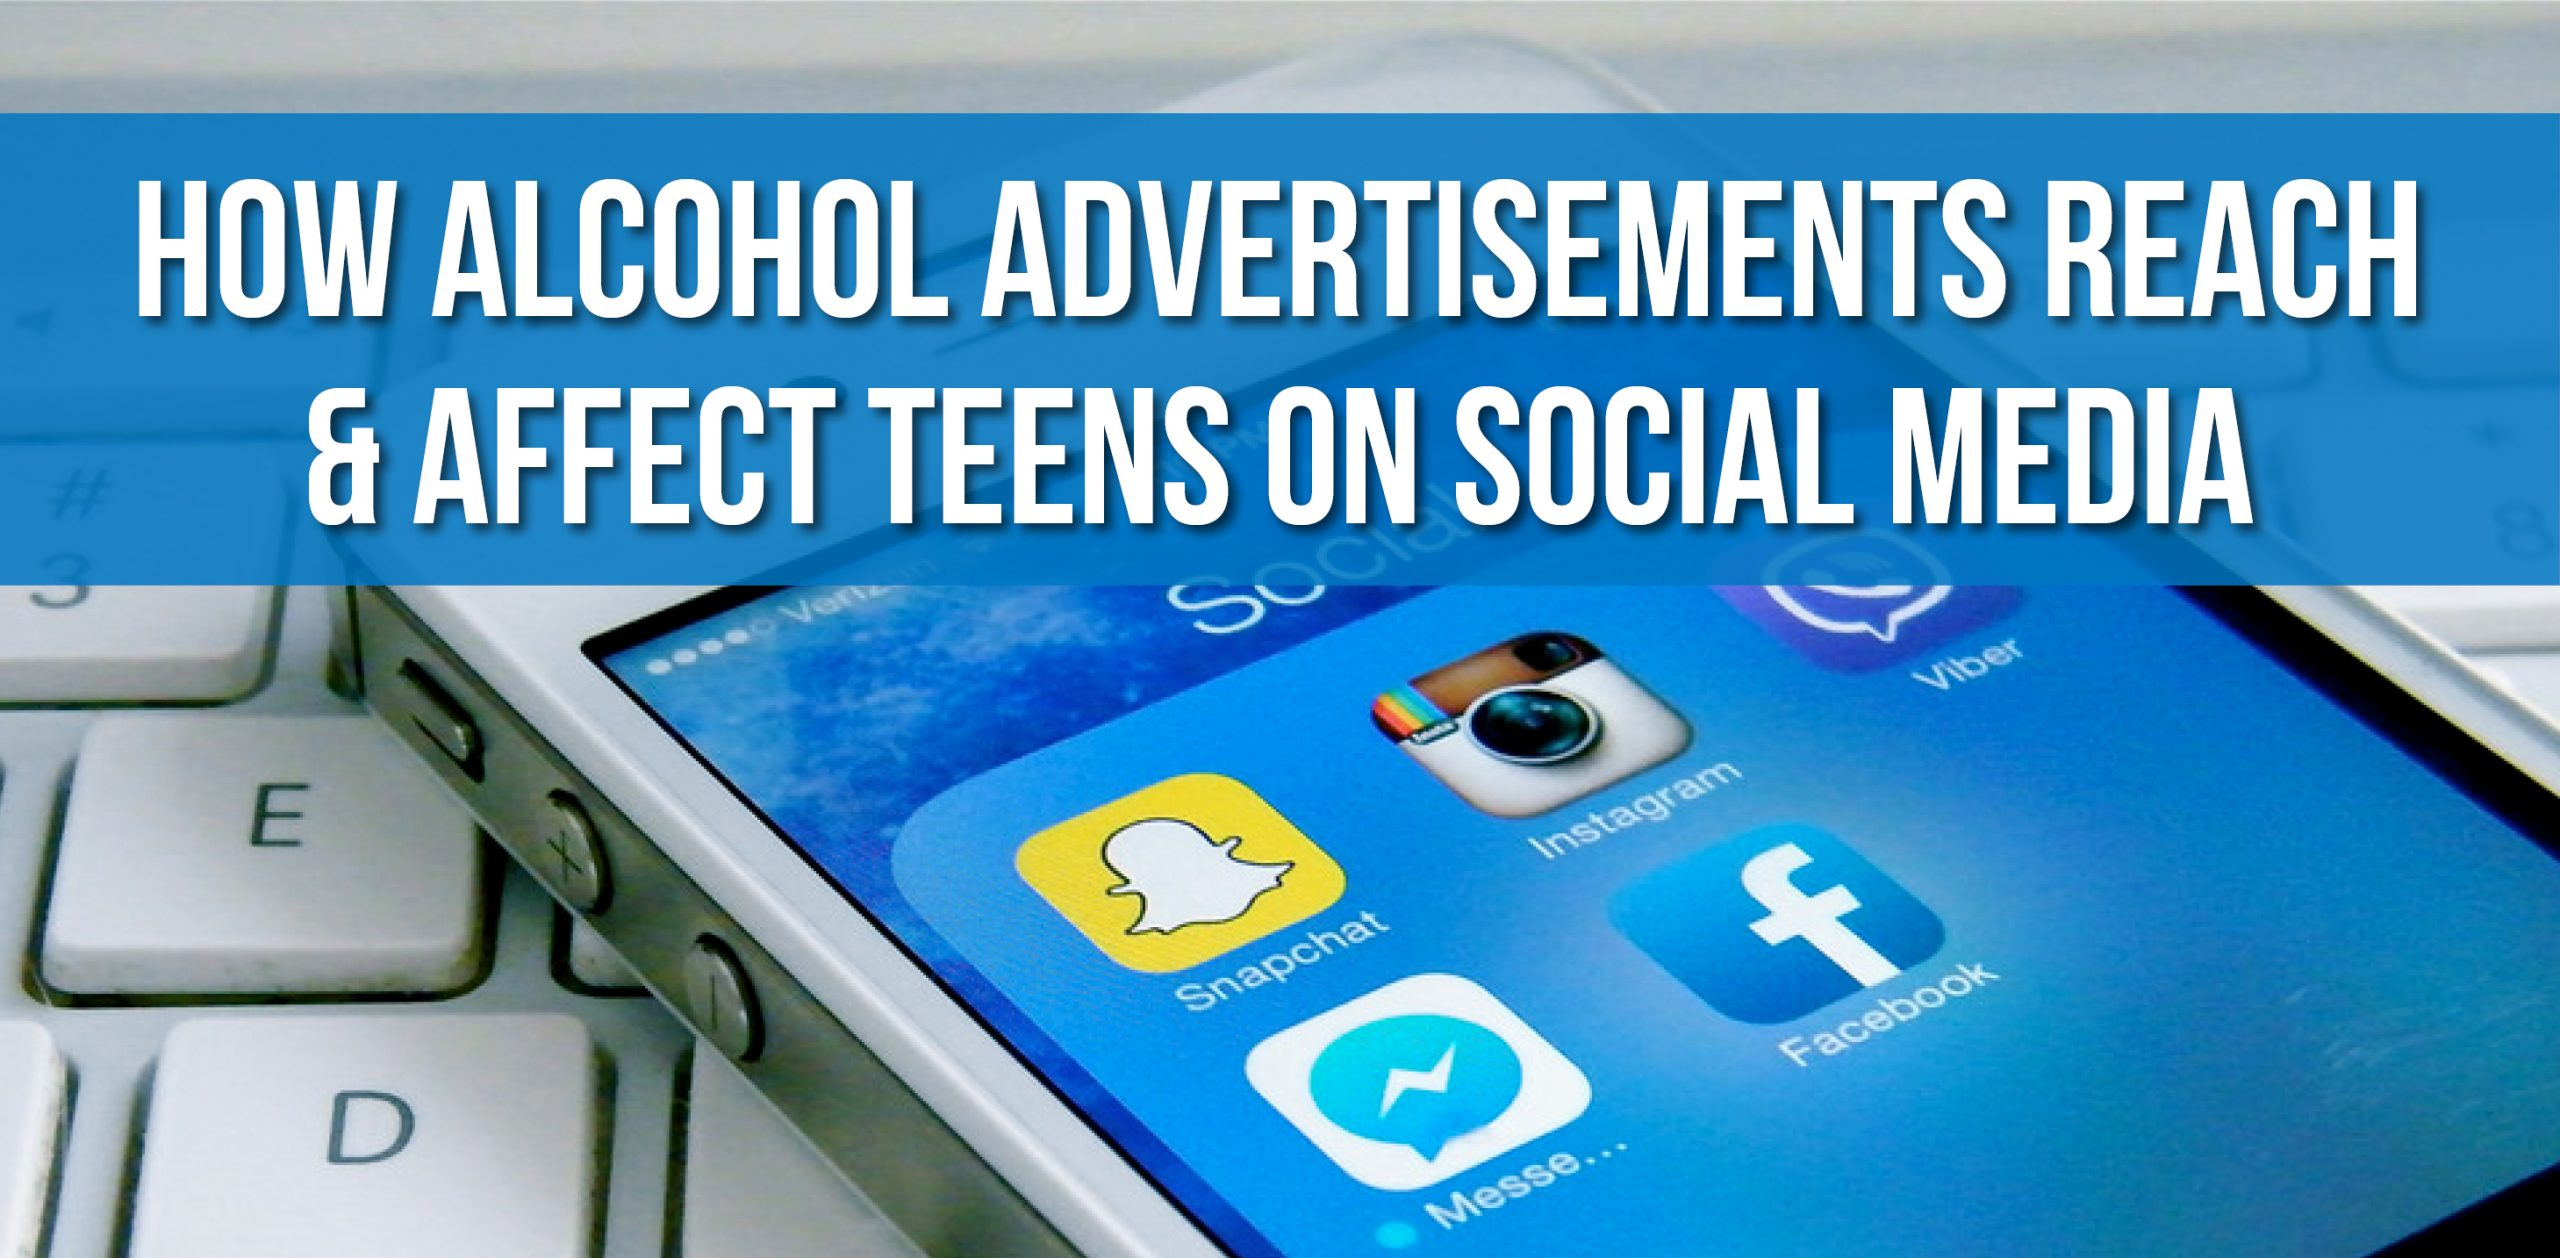 How alcohol advertisers reach teens through social media